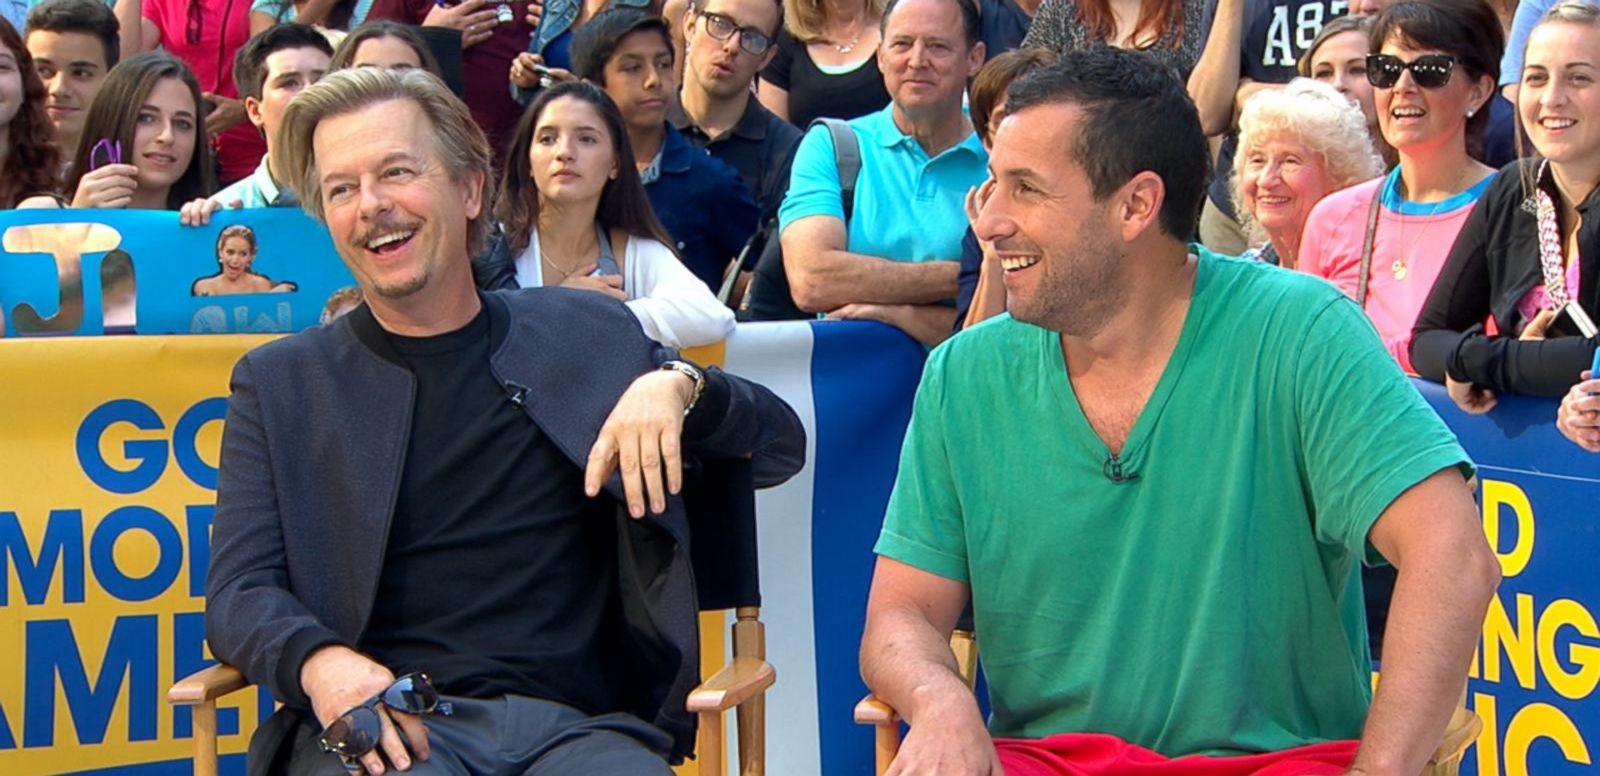 VIDEO: Adam Sandler, David Spade Star in New Netflix Comedy